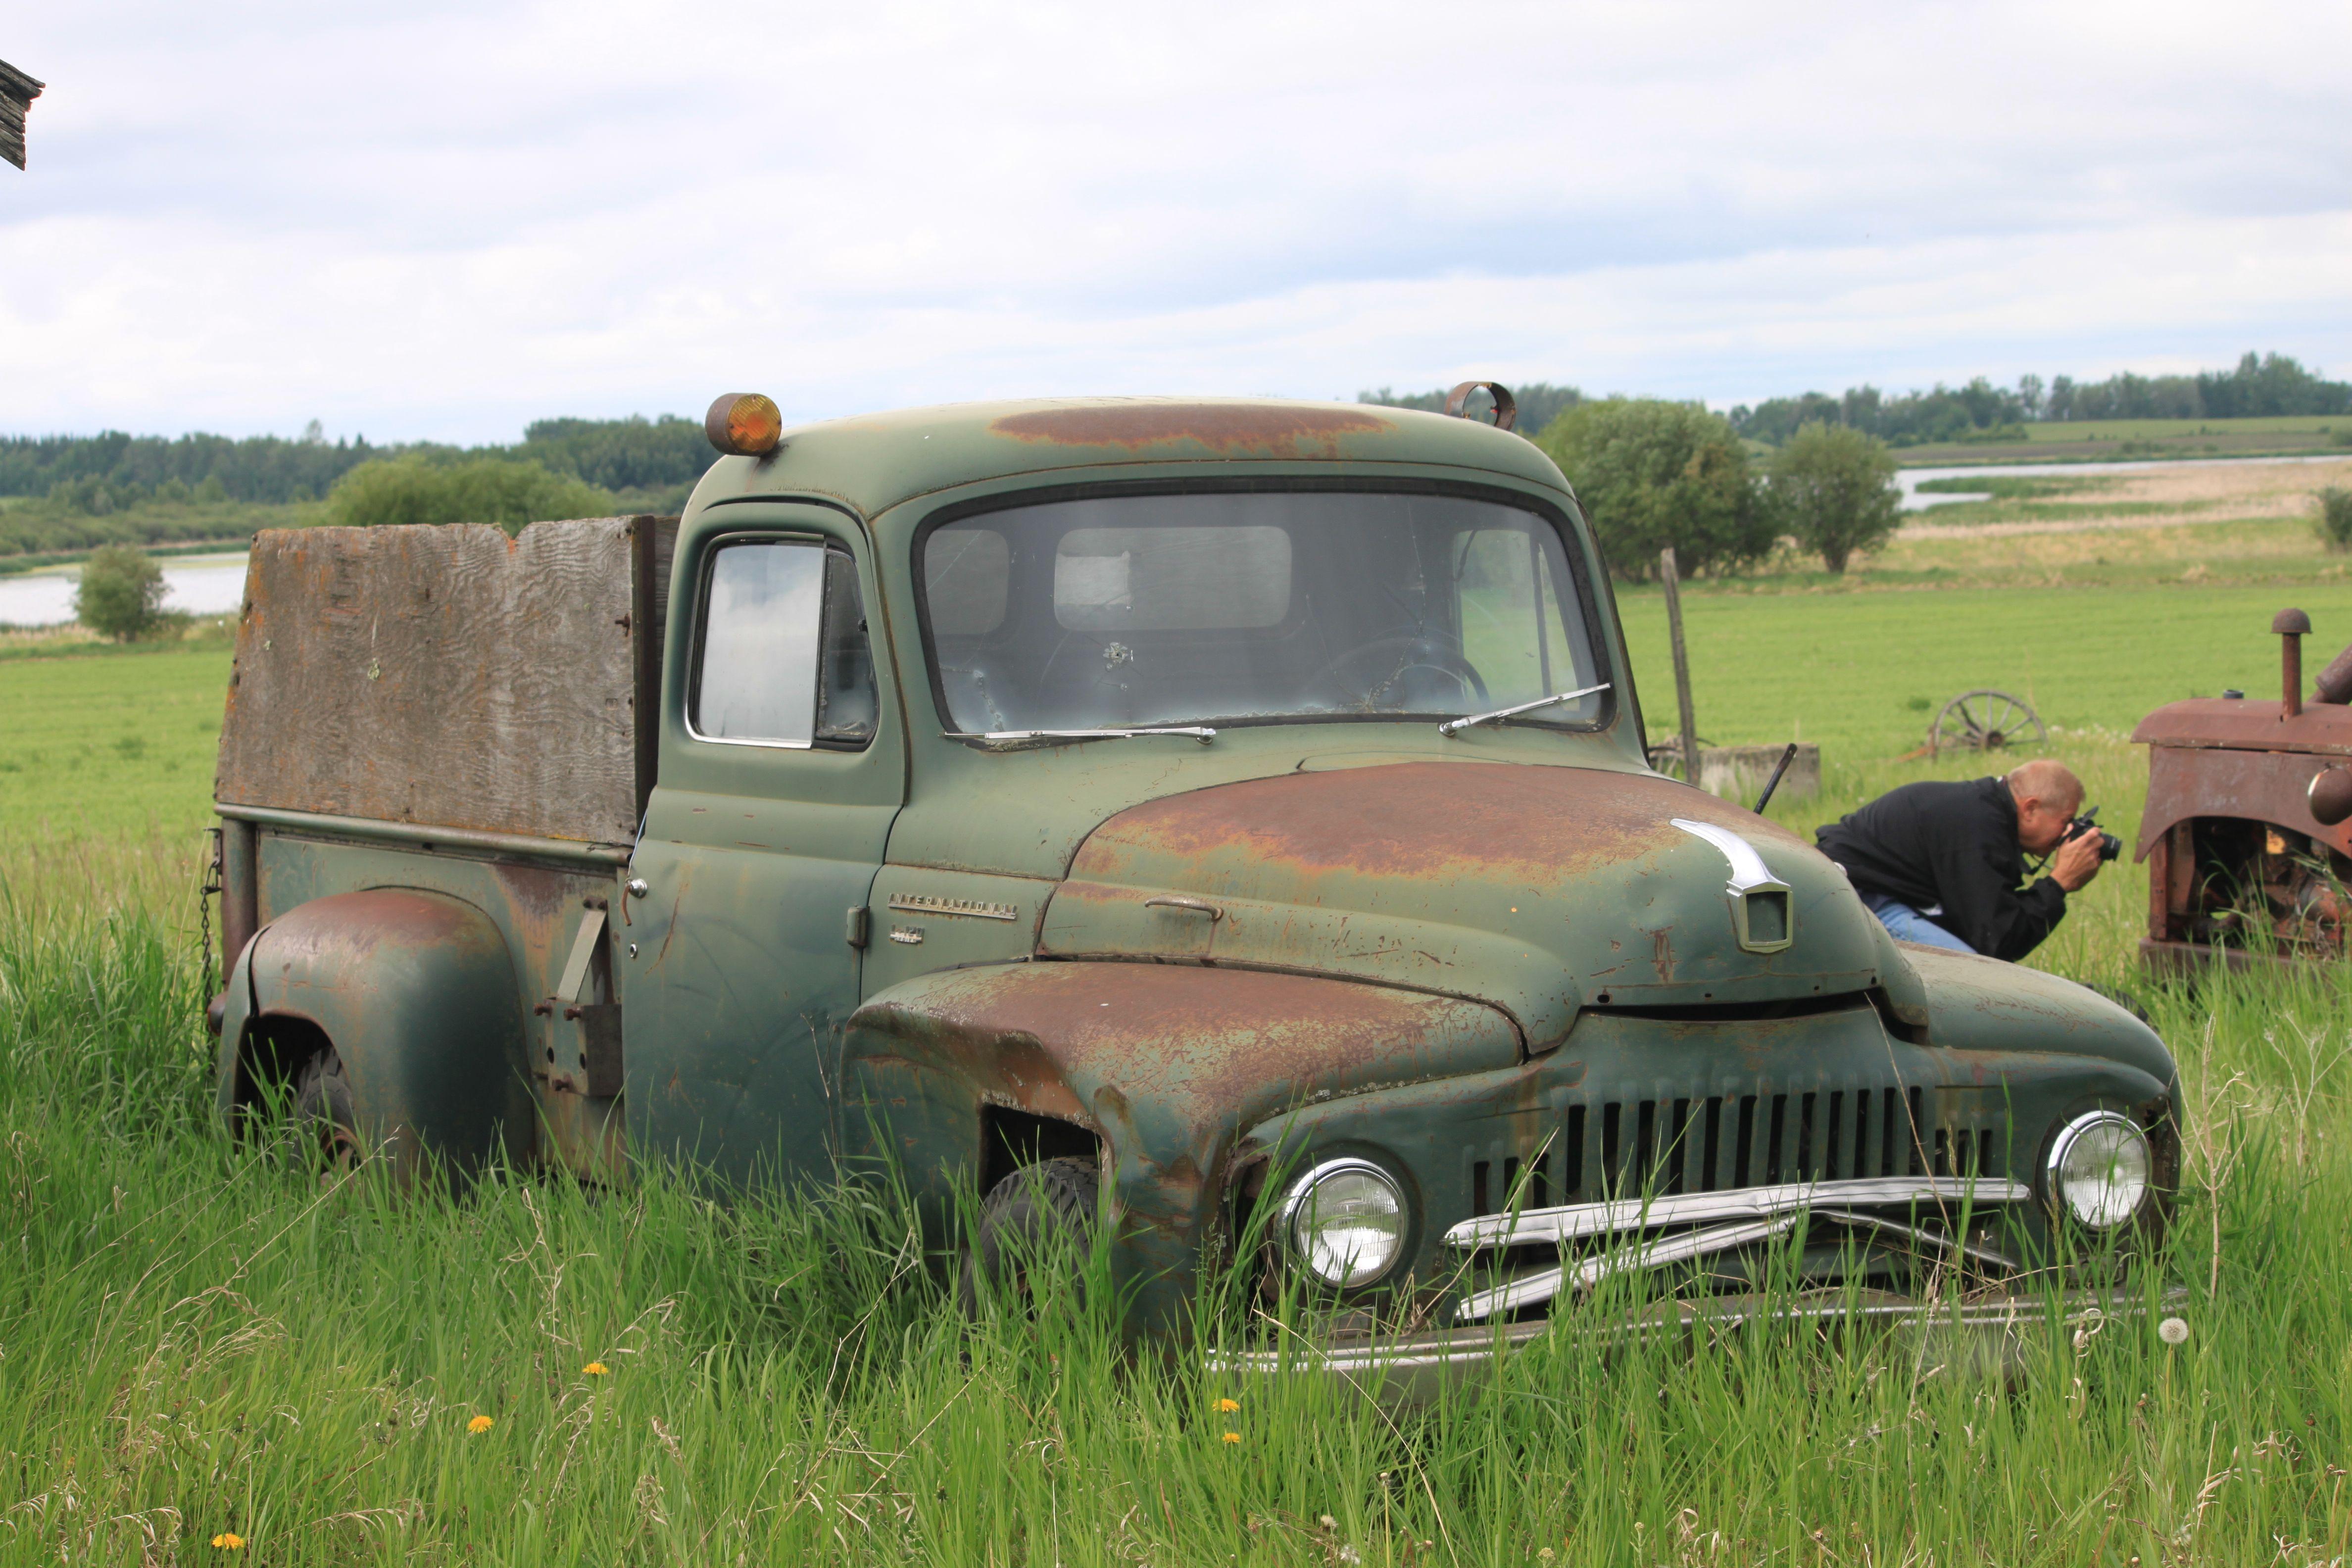 1952 International pickup  | International trucks